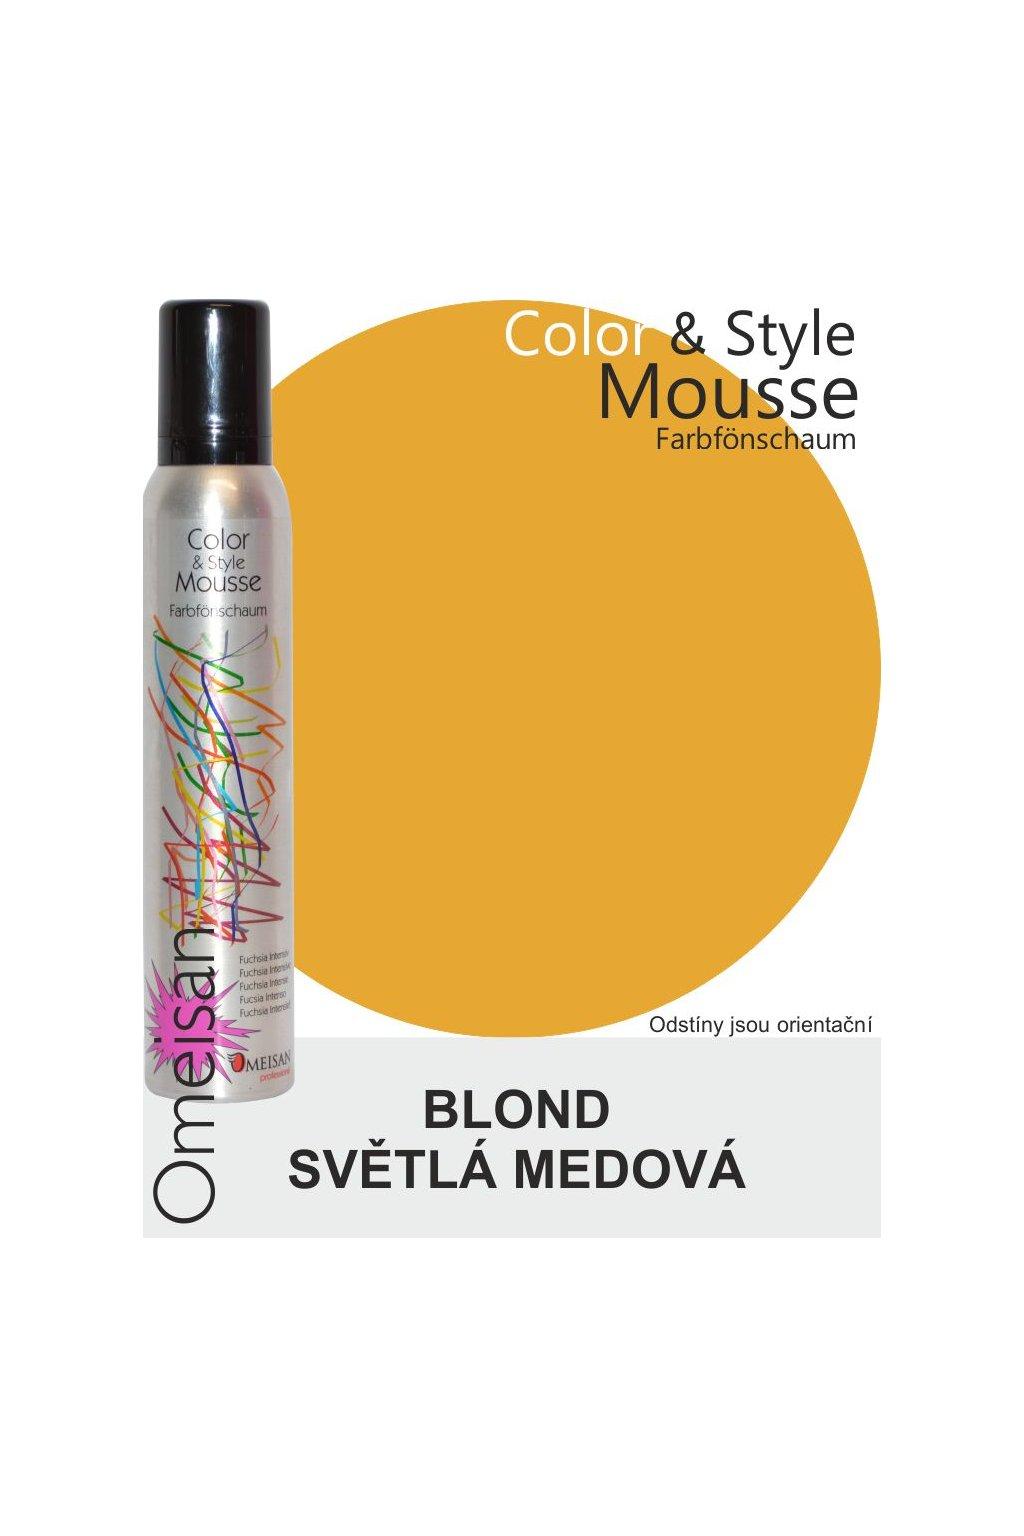 6437 omeisan barevna pena tuzici helles honigblond 200ml blond svetla medova